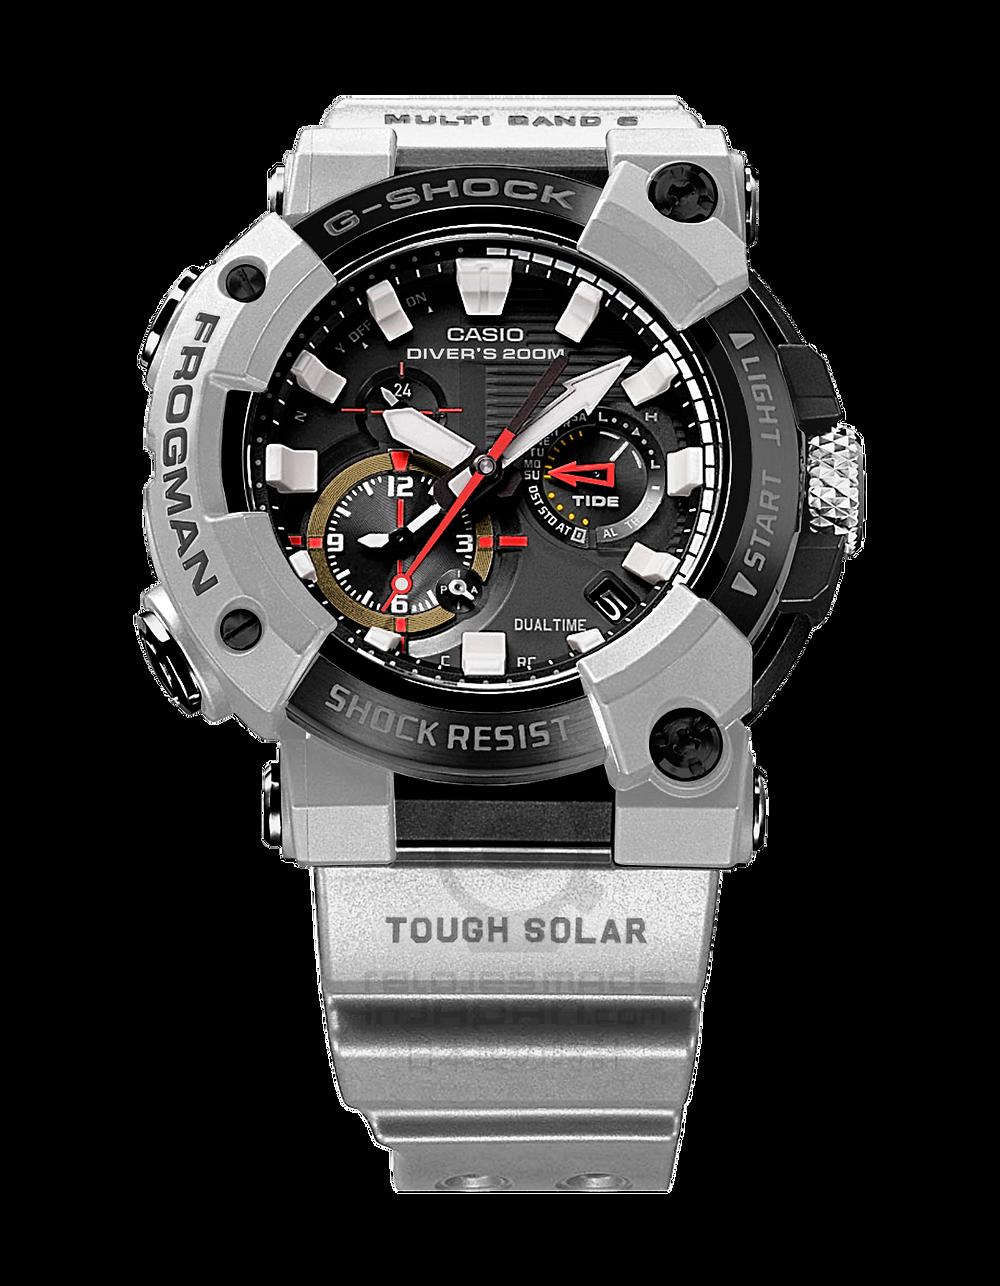 reloj instrumento G-Shock Frogman GWF-A1000RN-8AER para buceo edición limitada Royal Navy 2021